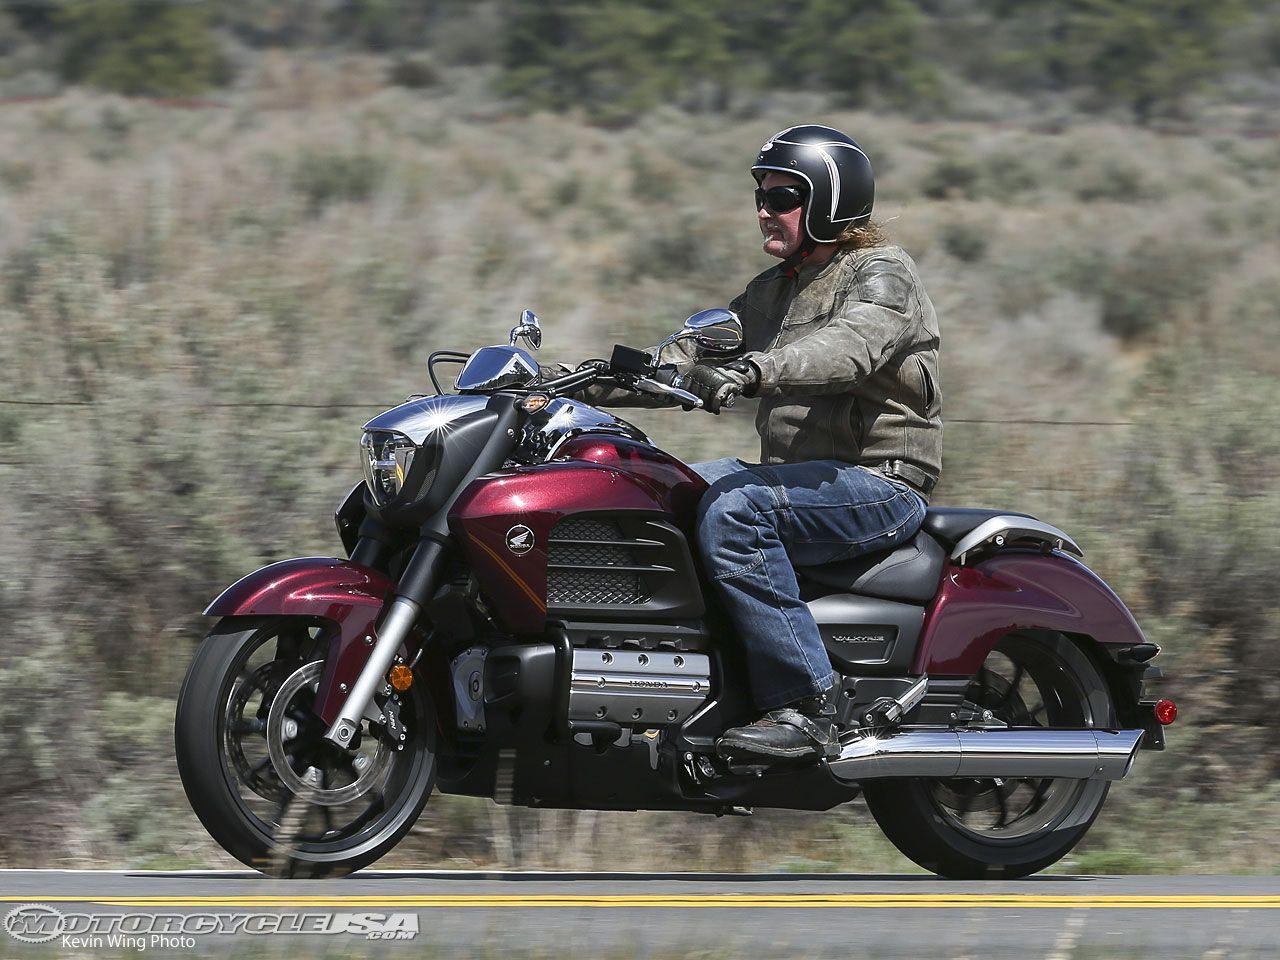 2014 Honda Valkyrie First Ride Photos Motorcycle USA